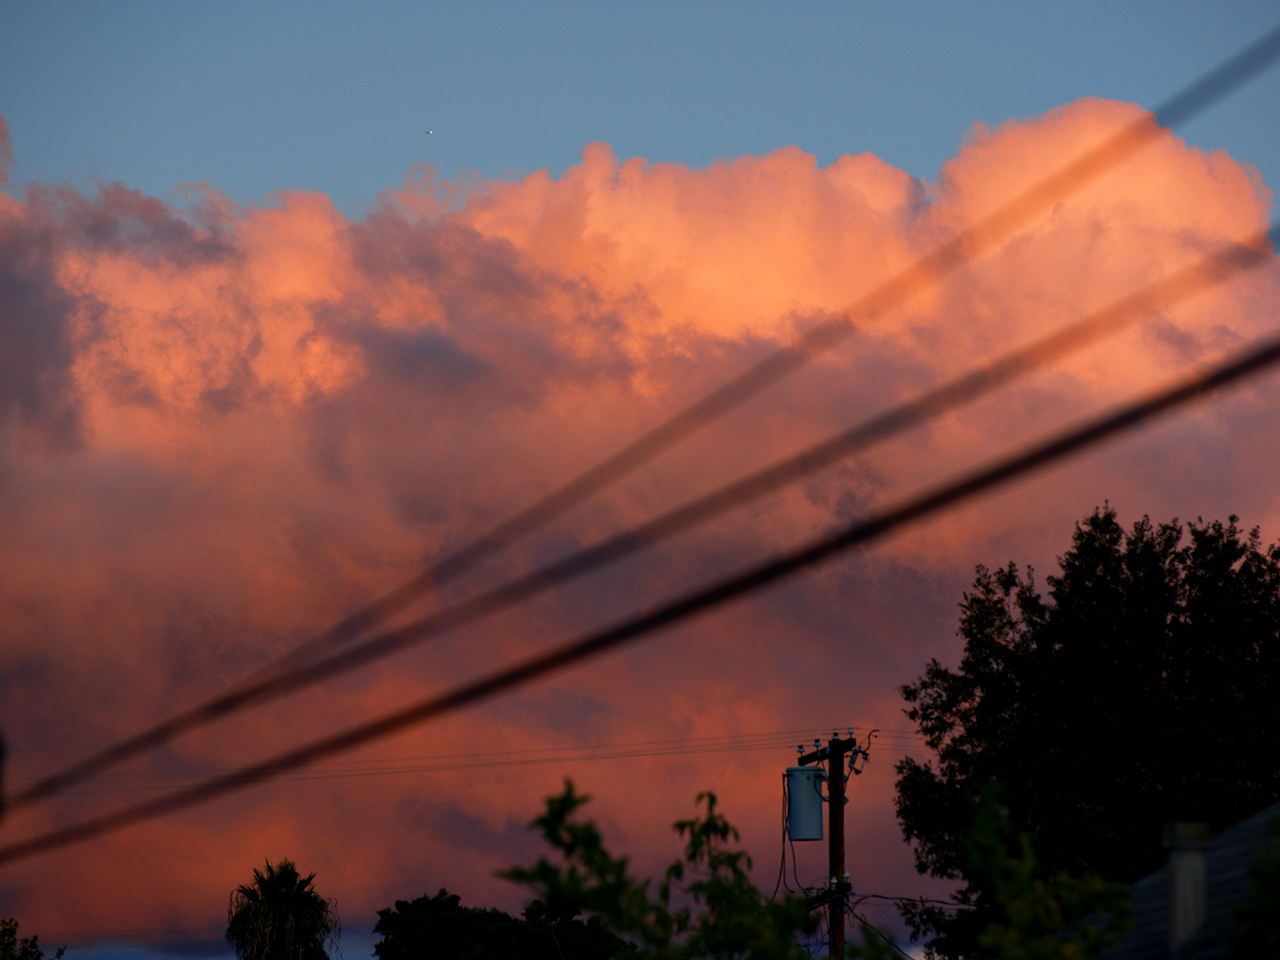 sunset-9-22-07.jpg